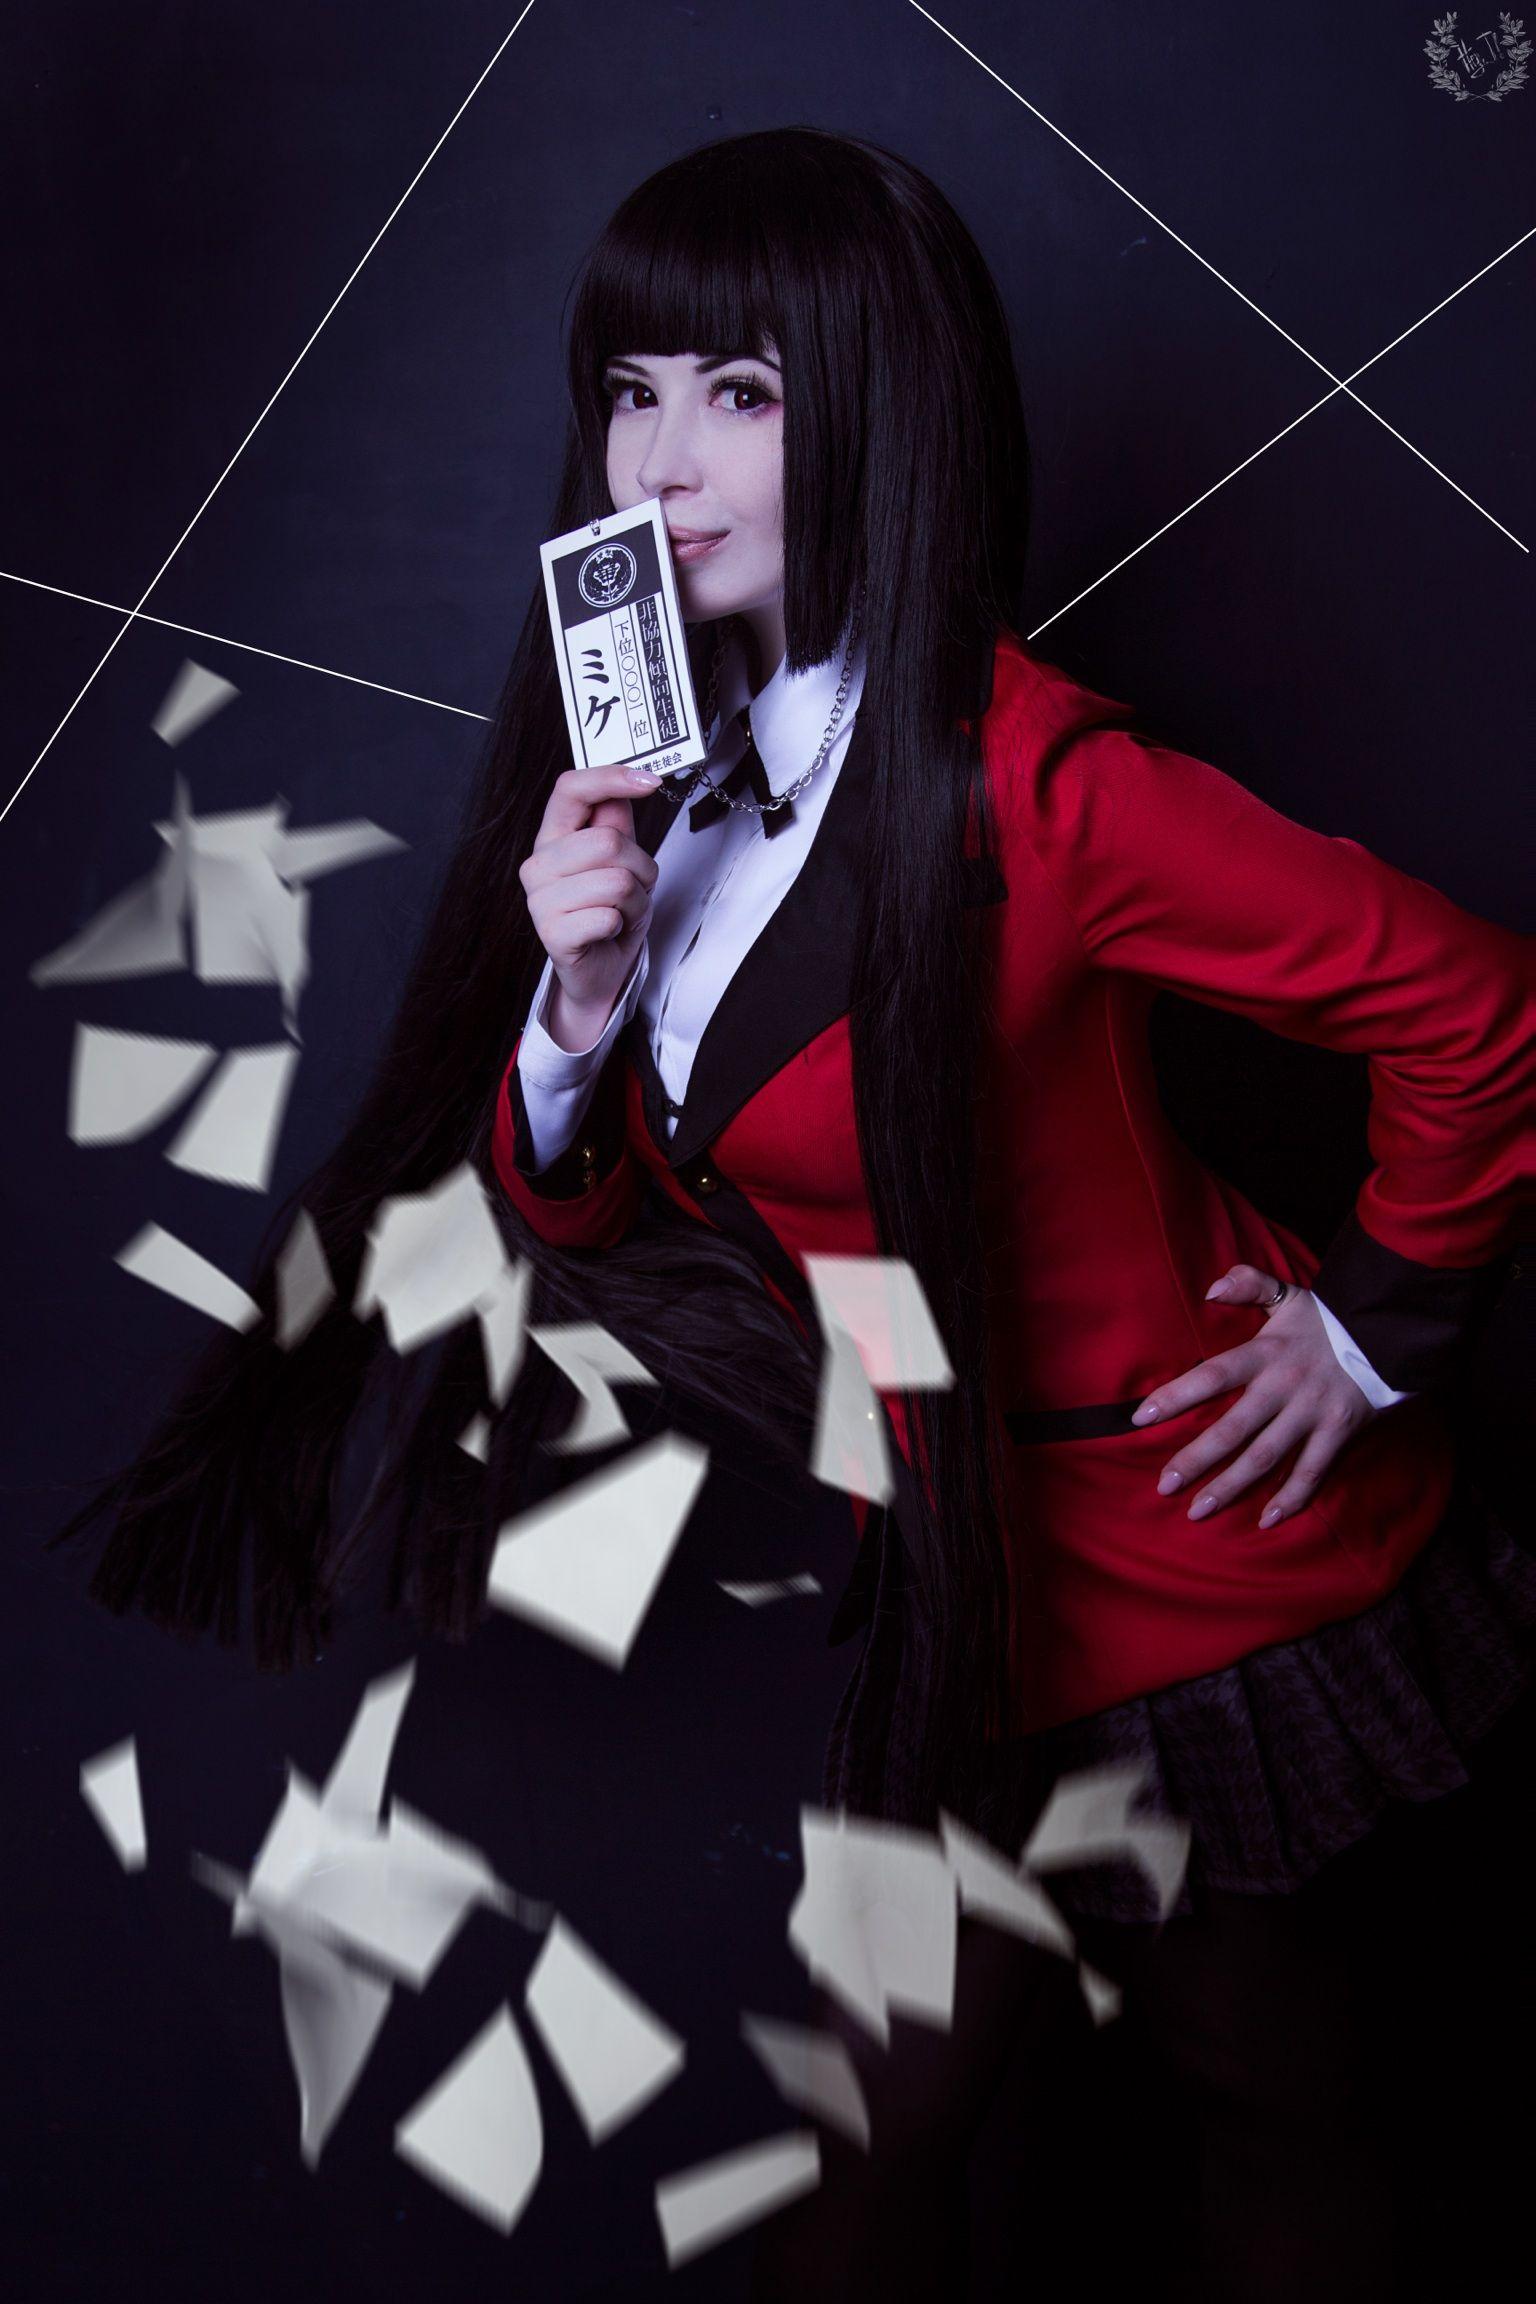 Pin by woofkid on Kakegurui cosplay   Cosplay anime ...